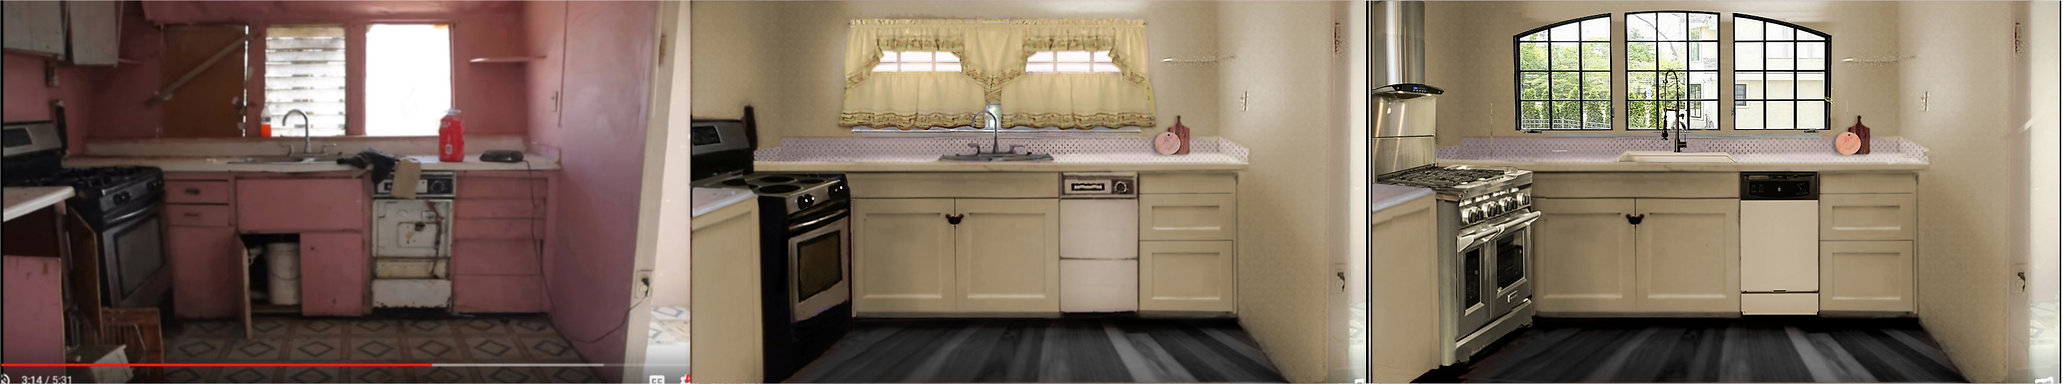 Pink to nice kitchen.jpg